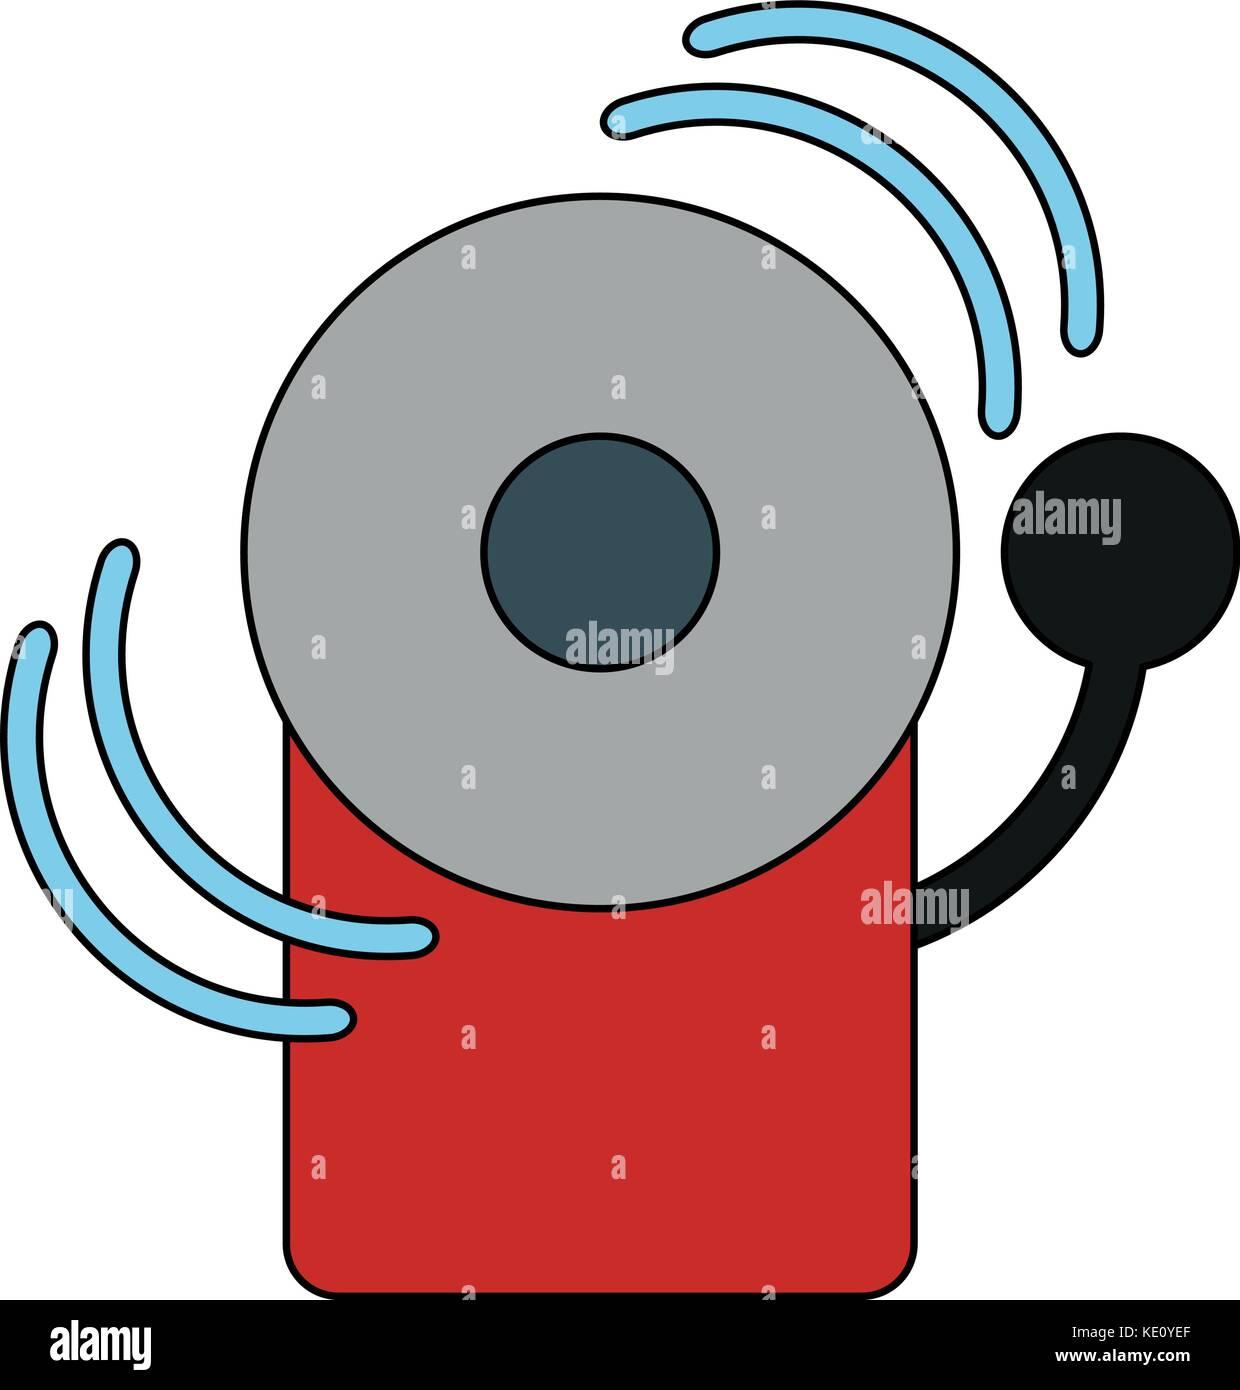 fire alarm icon image  - Stock Image